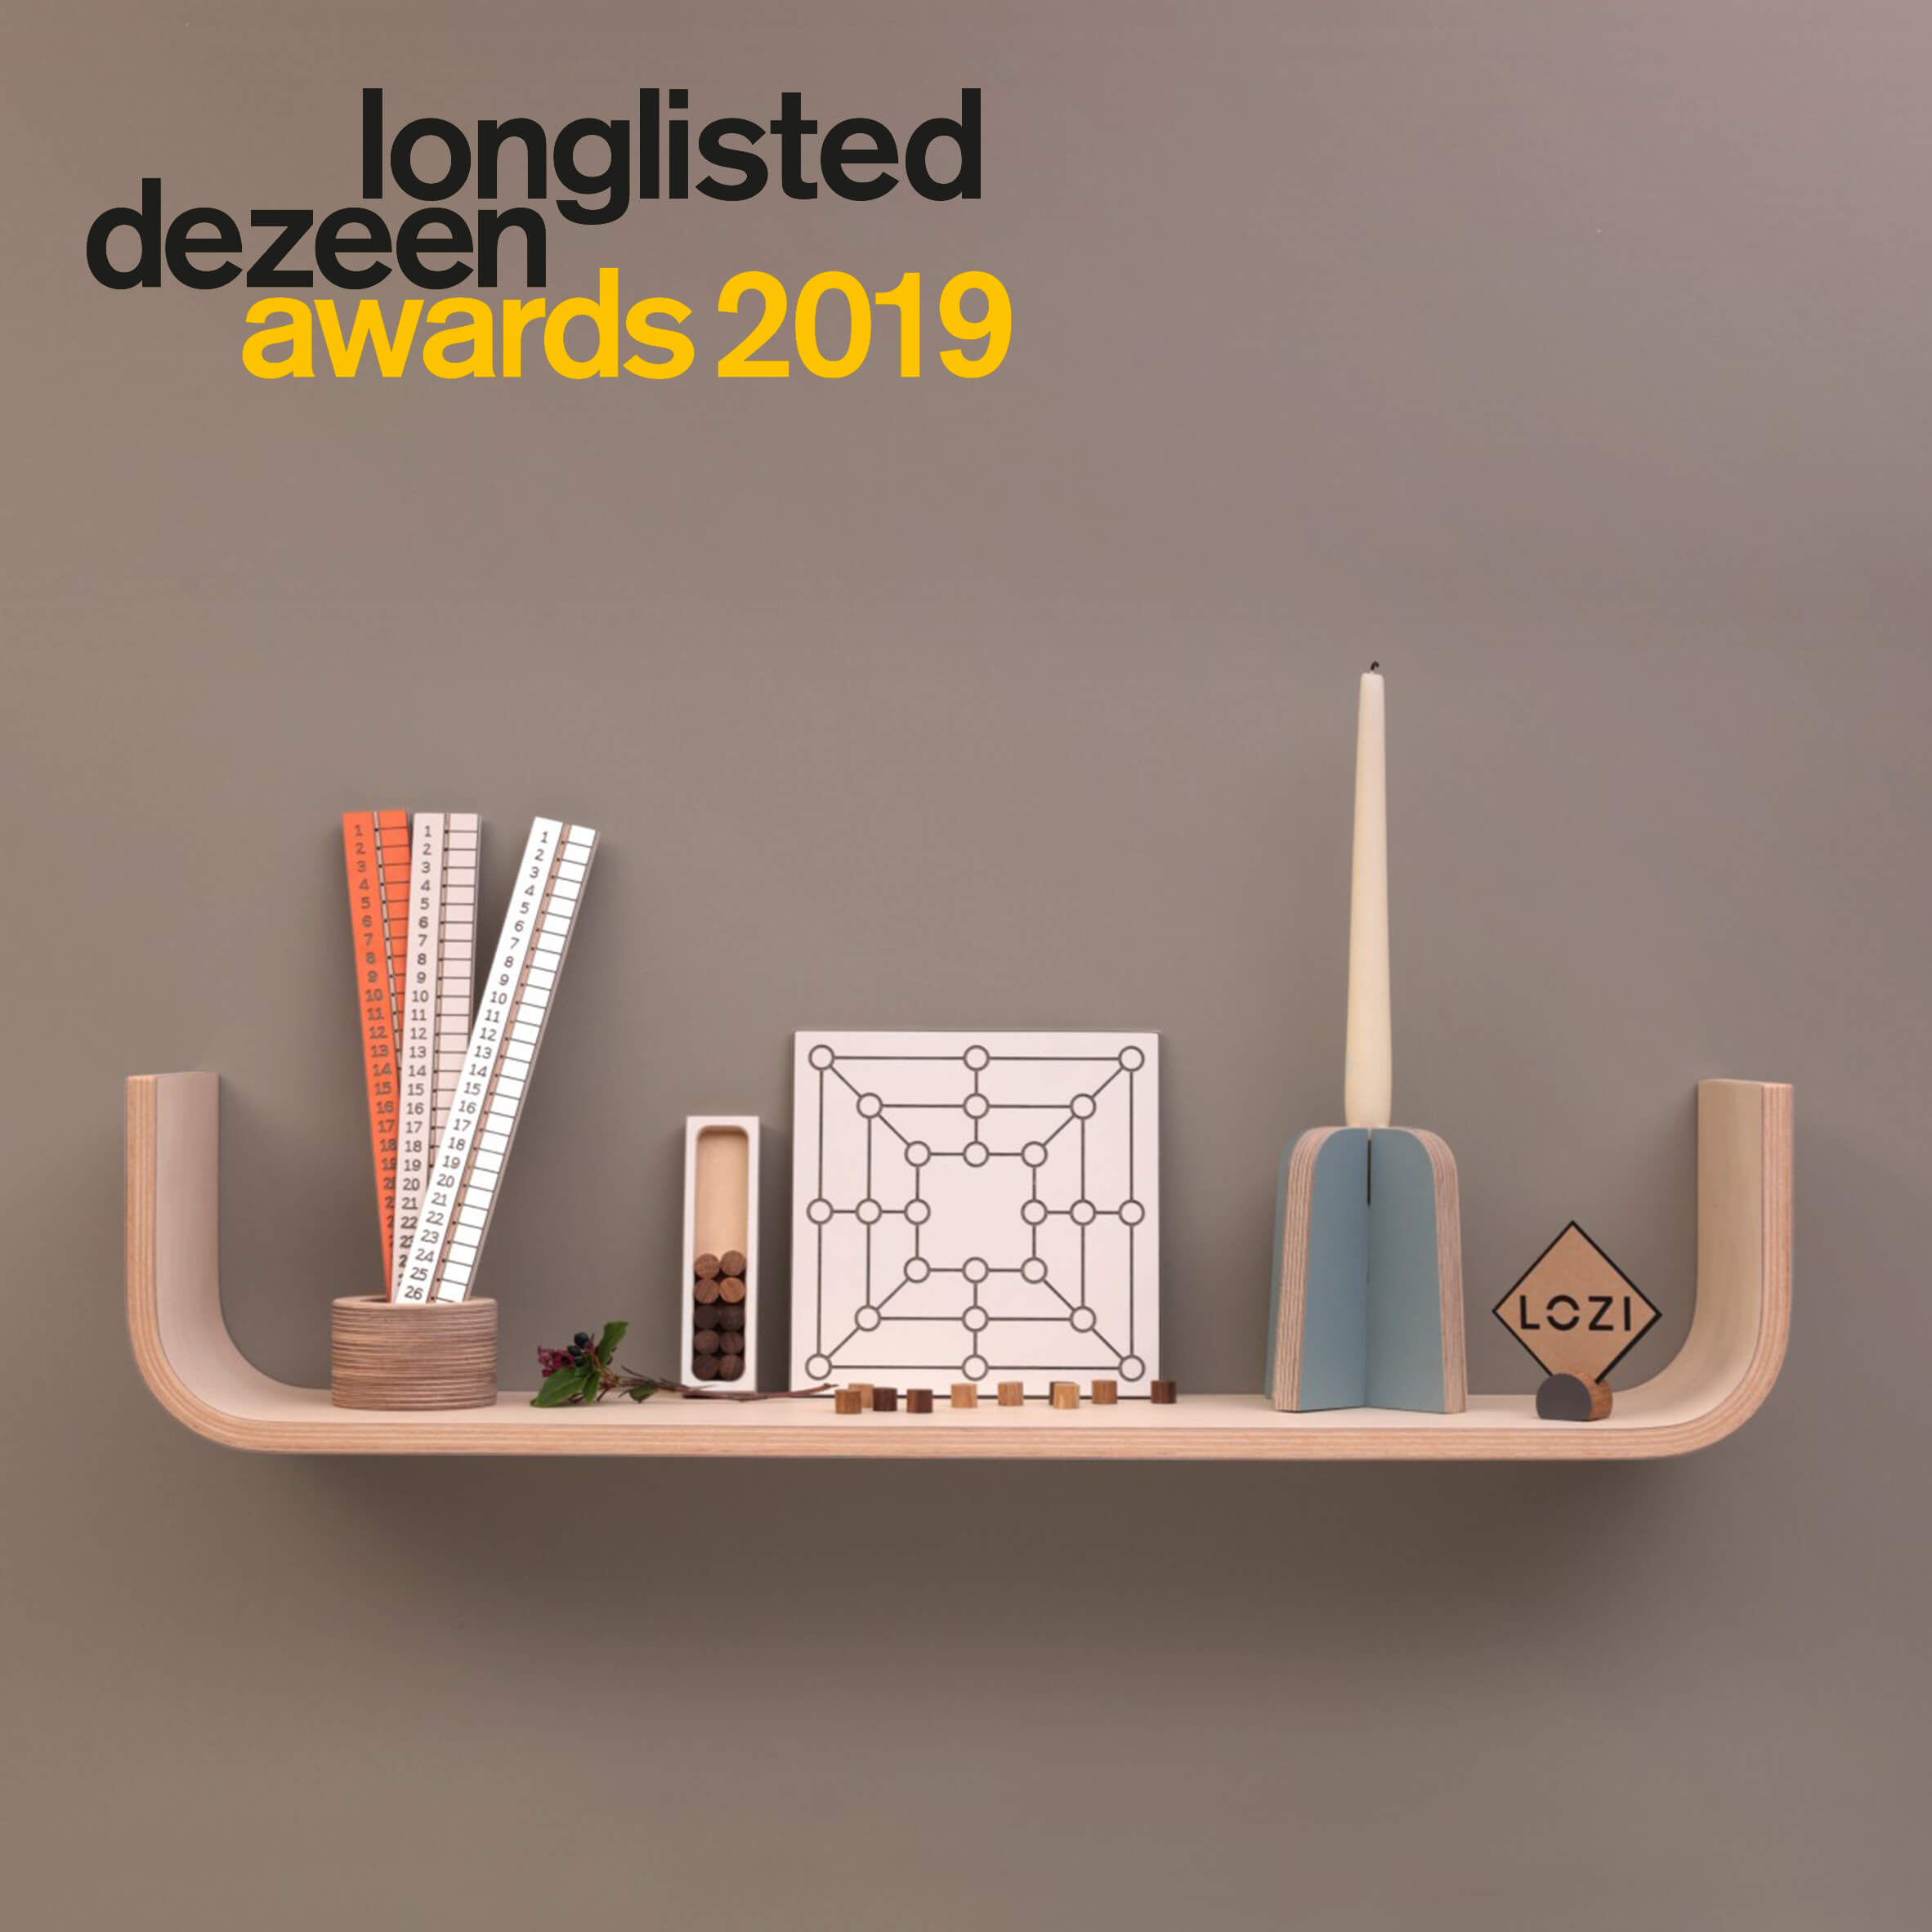 dezee-awards-2019-999-collection.jpg